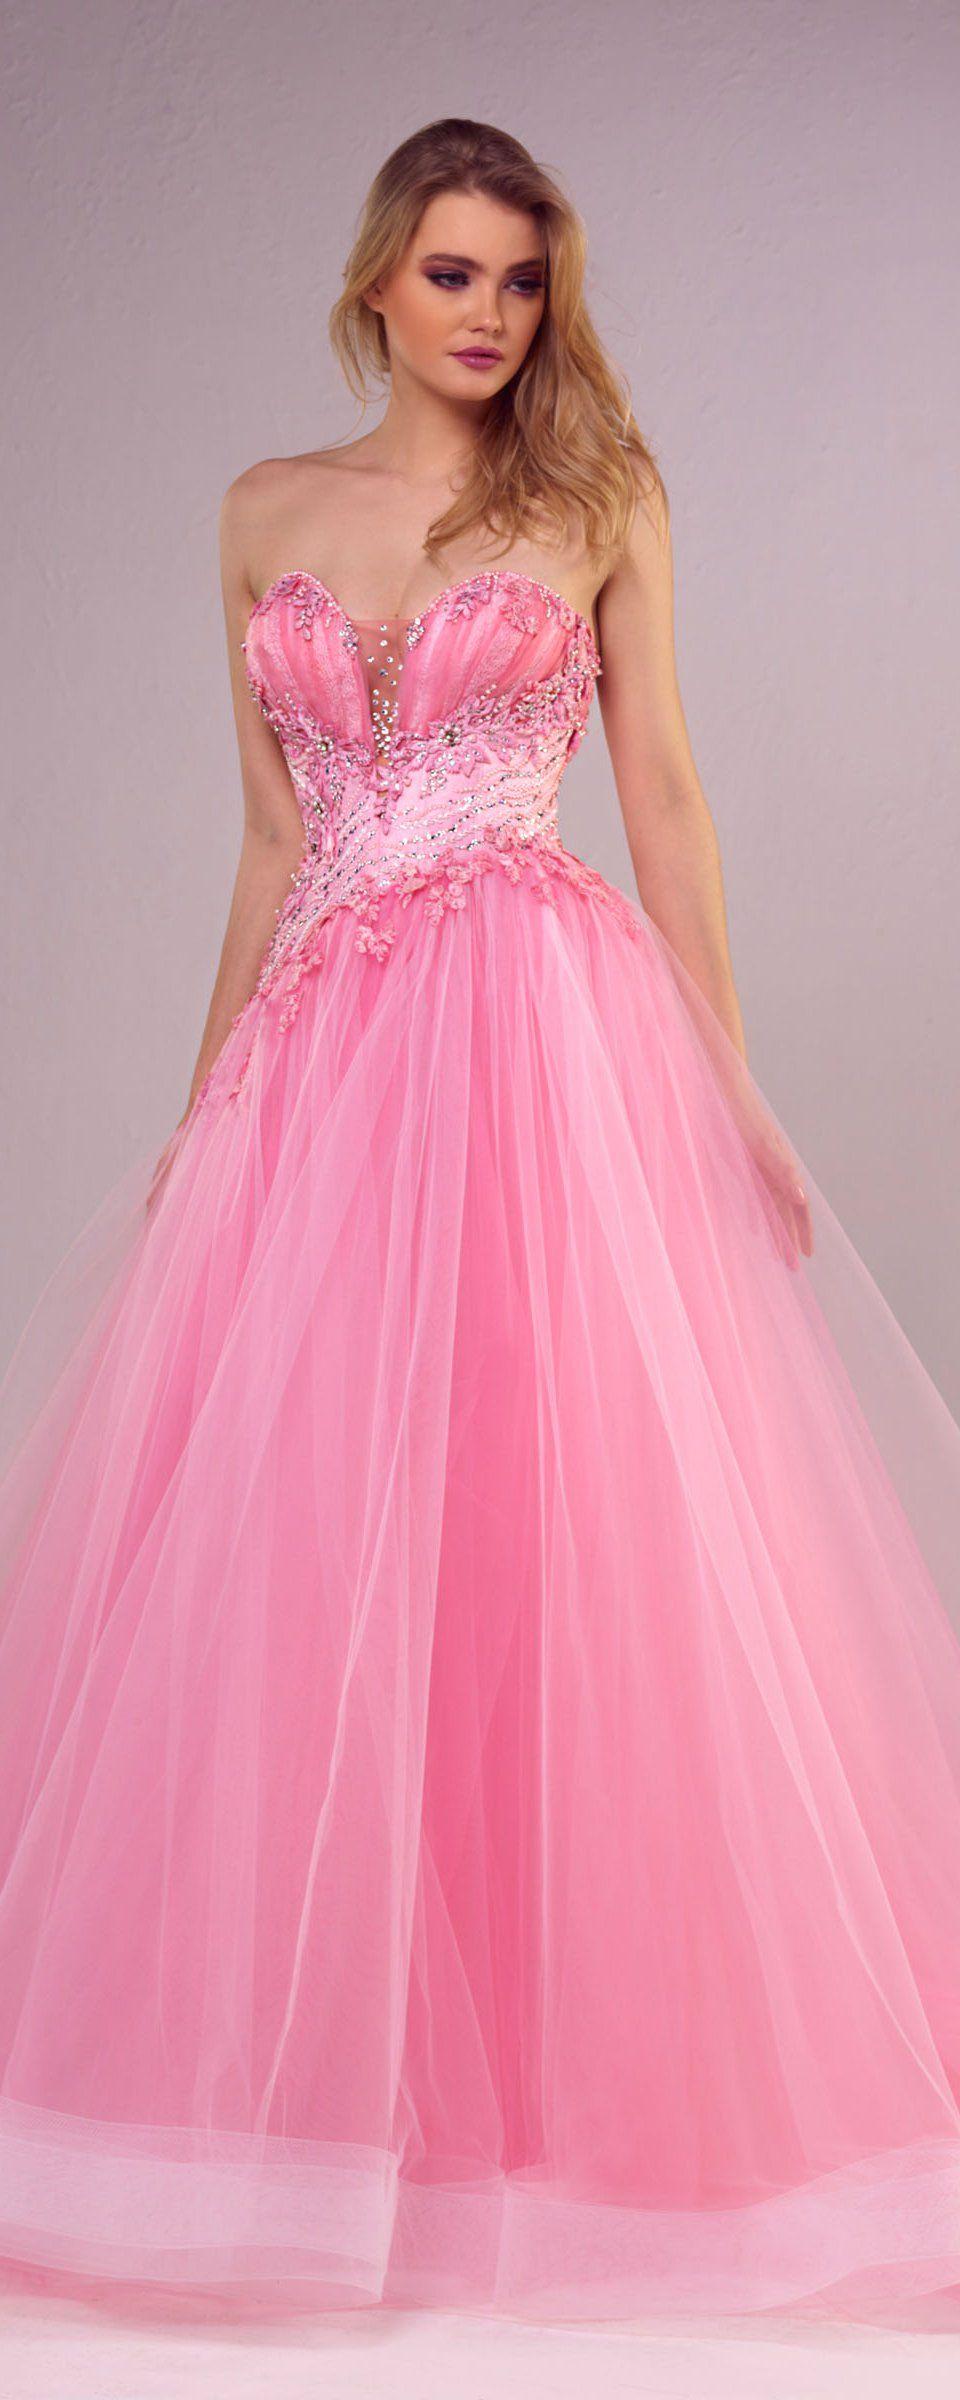 Tony Chaaya 2018 collection - Couture | Vestidos de fiesta ...